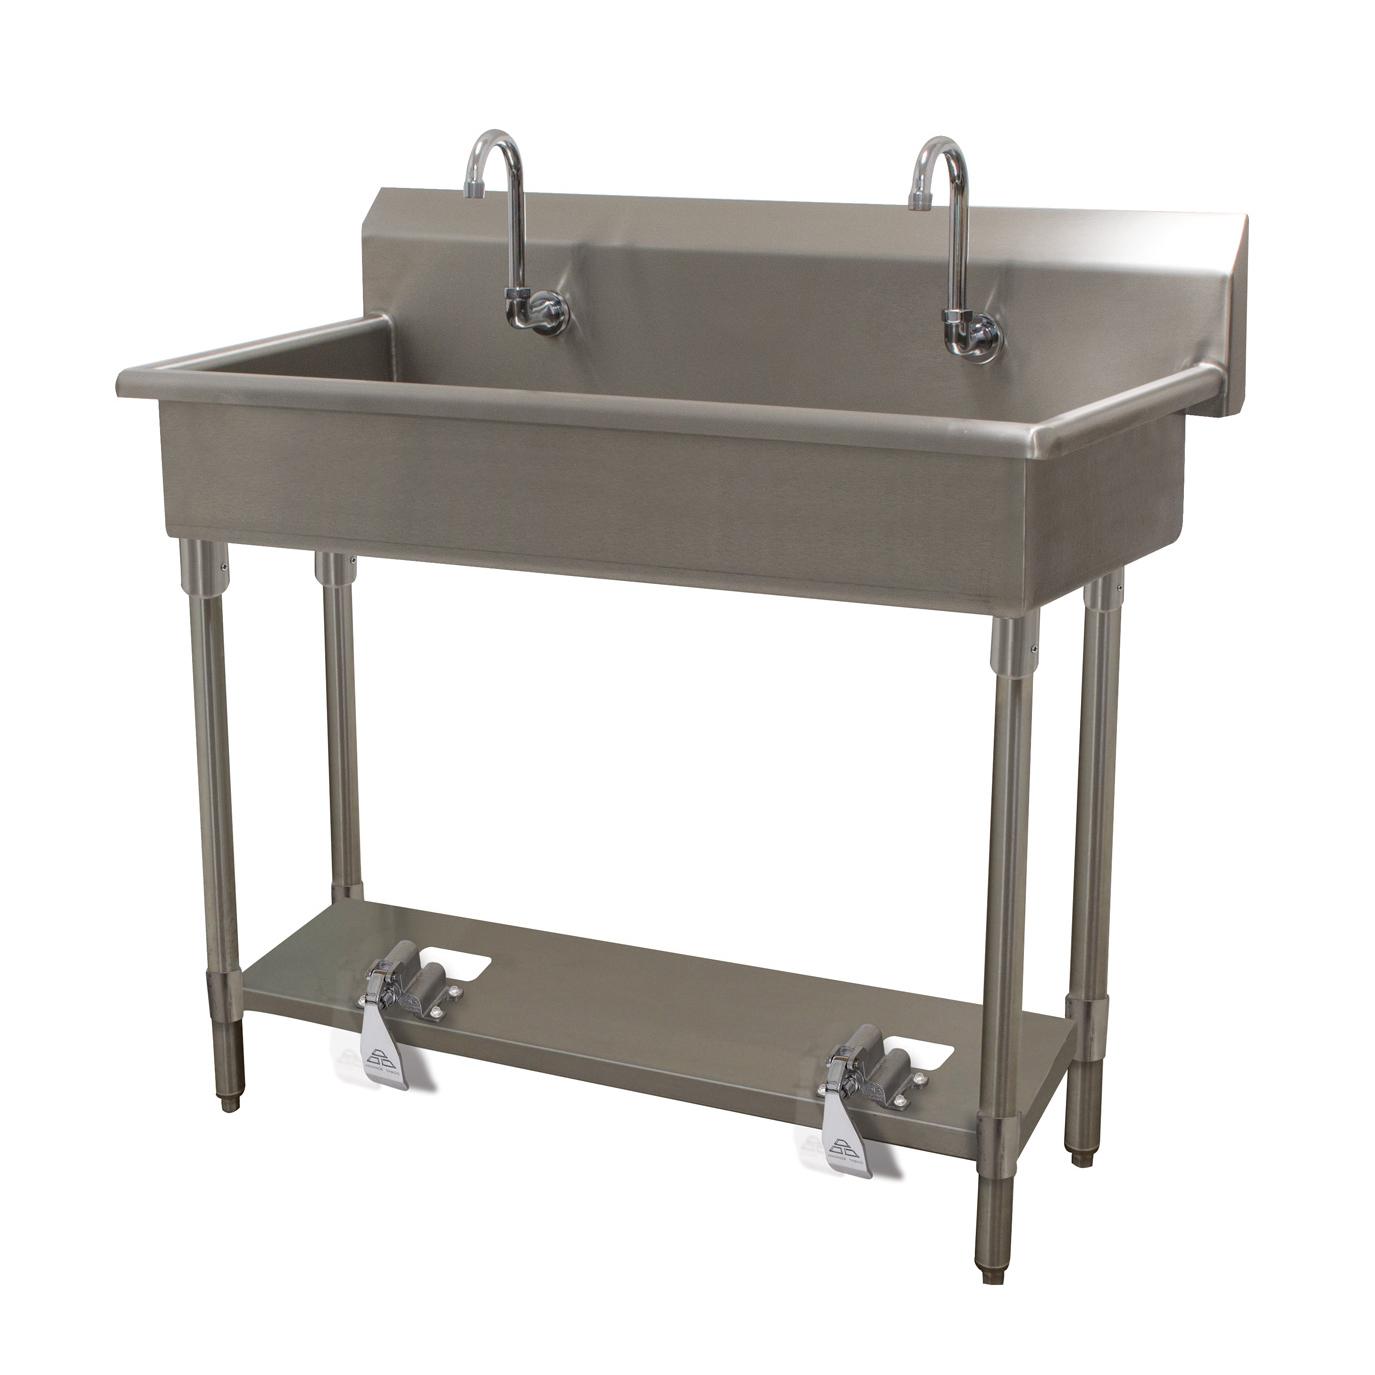 Advance Tabco FS-FM-40FV sink, hand